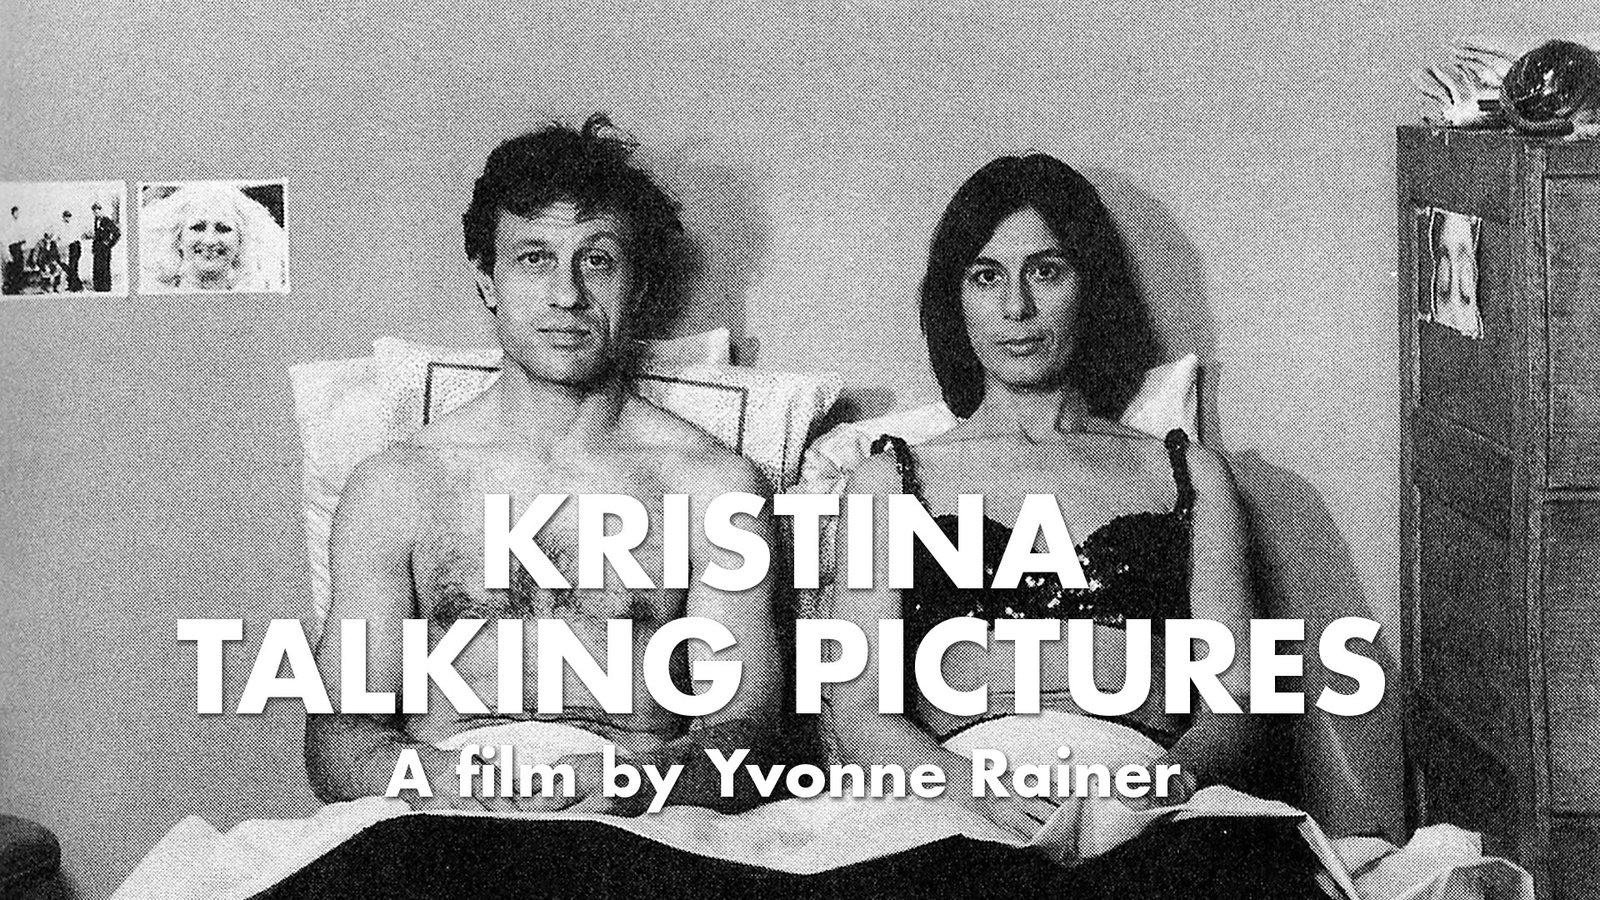 Kristina Talking Pictures